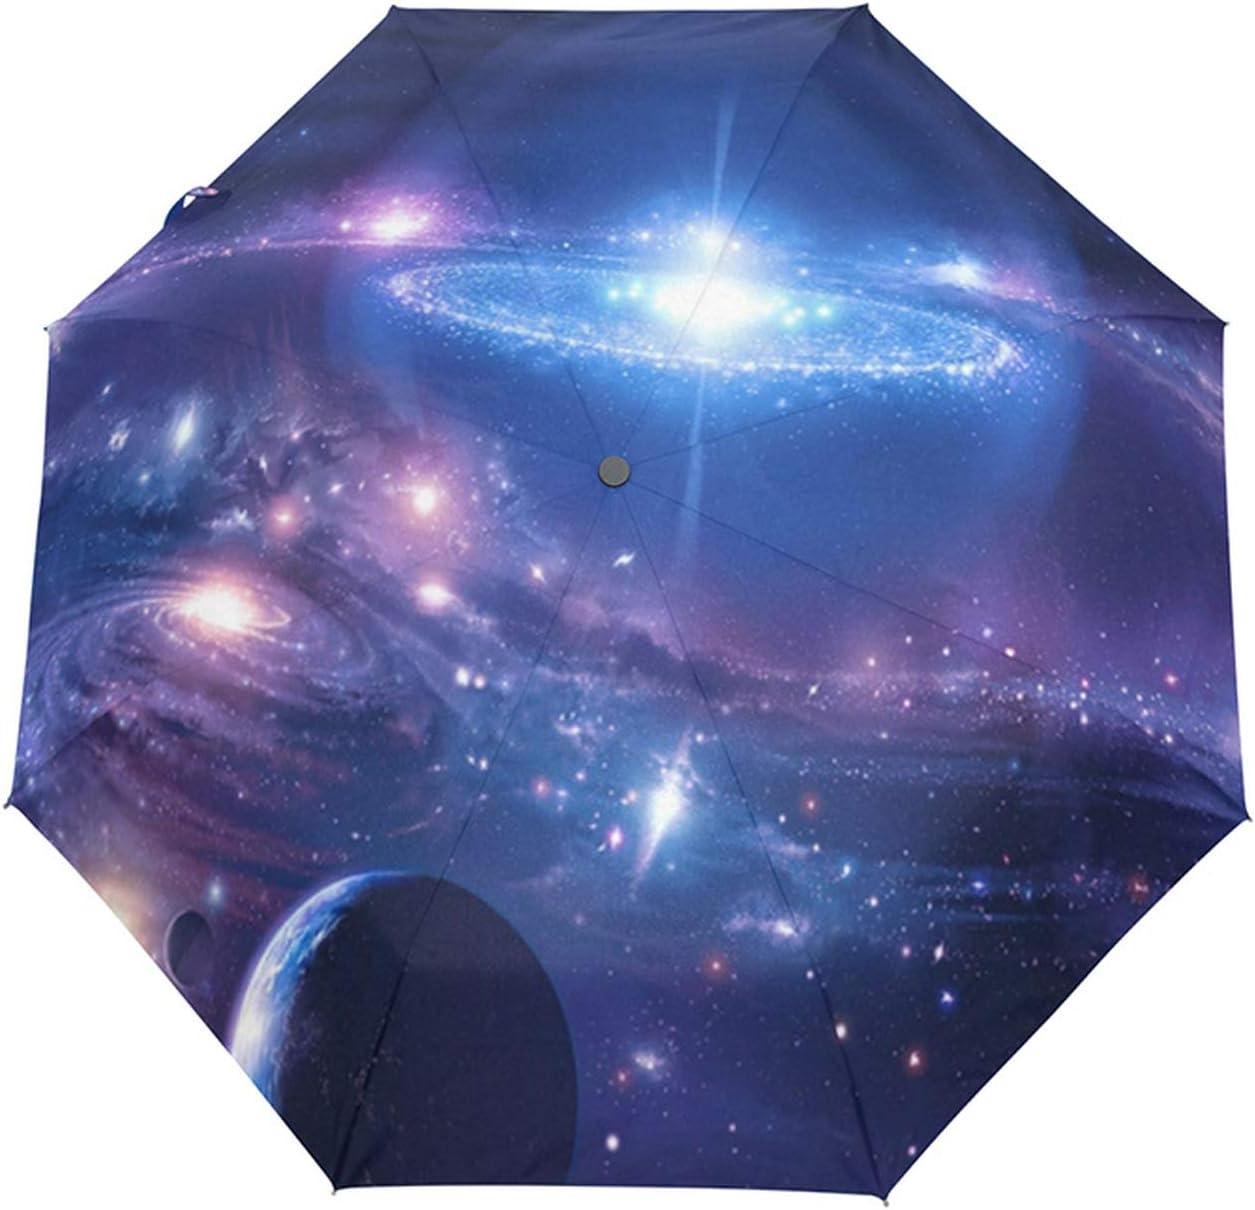 Galaxy Space Universe Nebula Cloud Custom Foldable Men Rain Umbrella Folding Travel Male Umbrella Rainy Windproof Parapluie,Full automatic